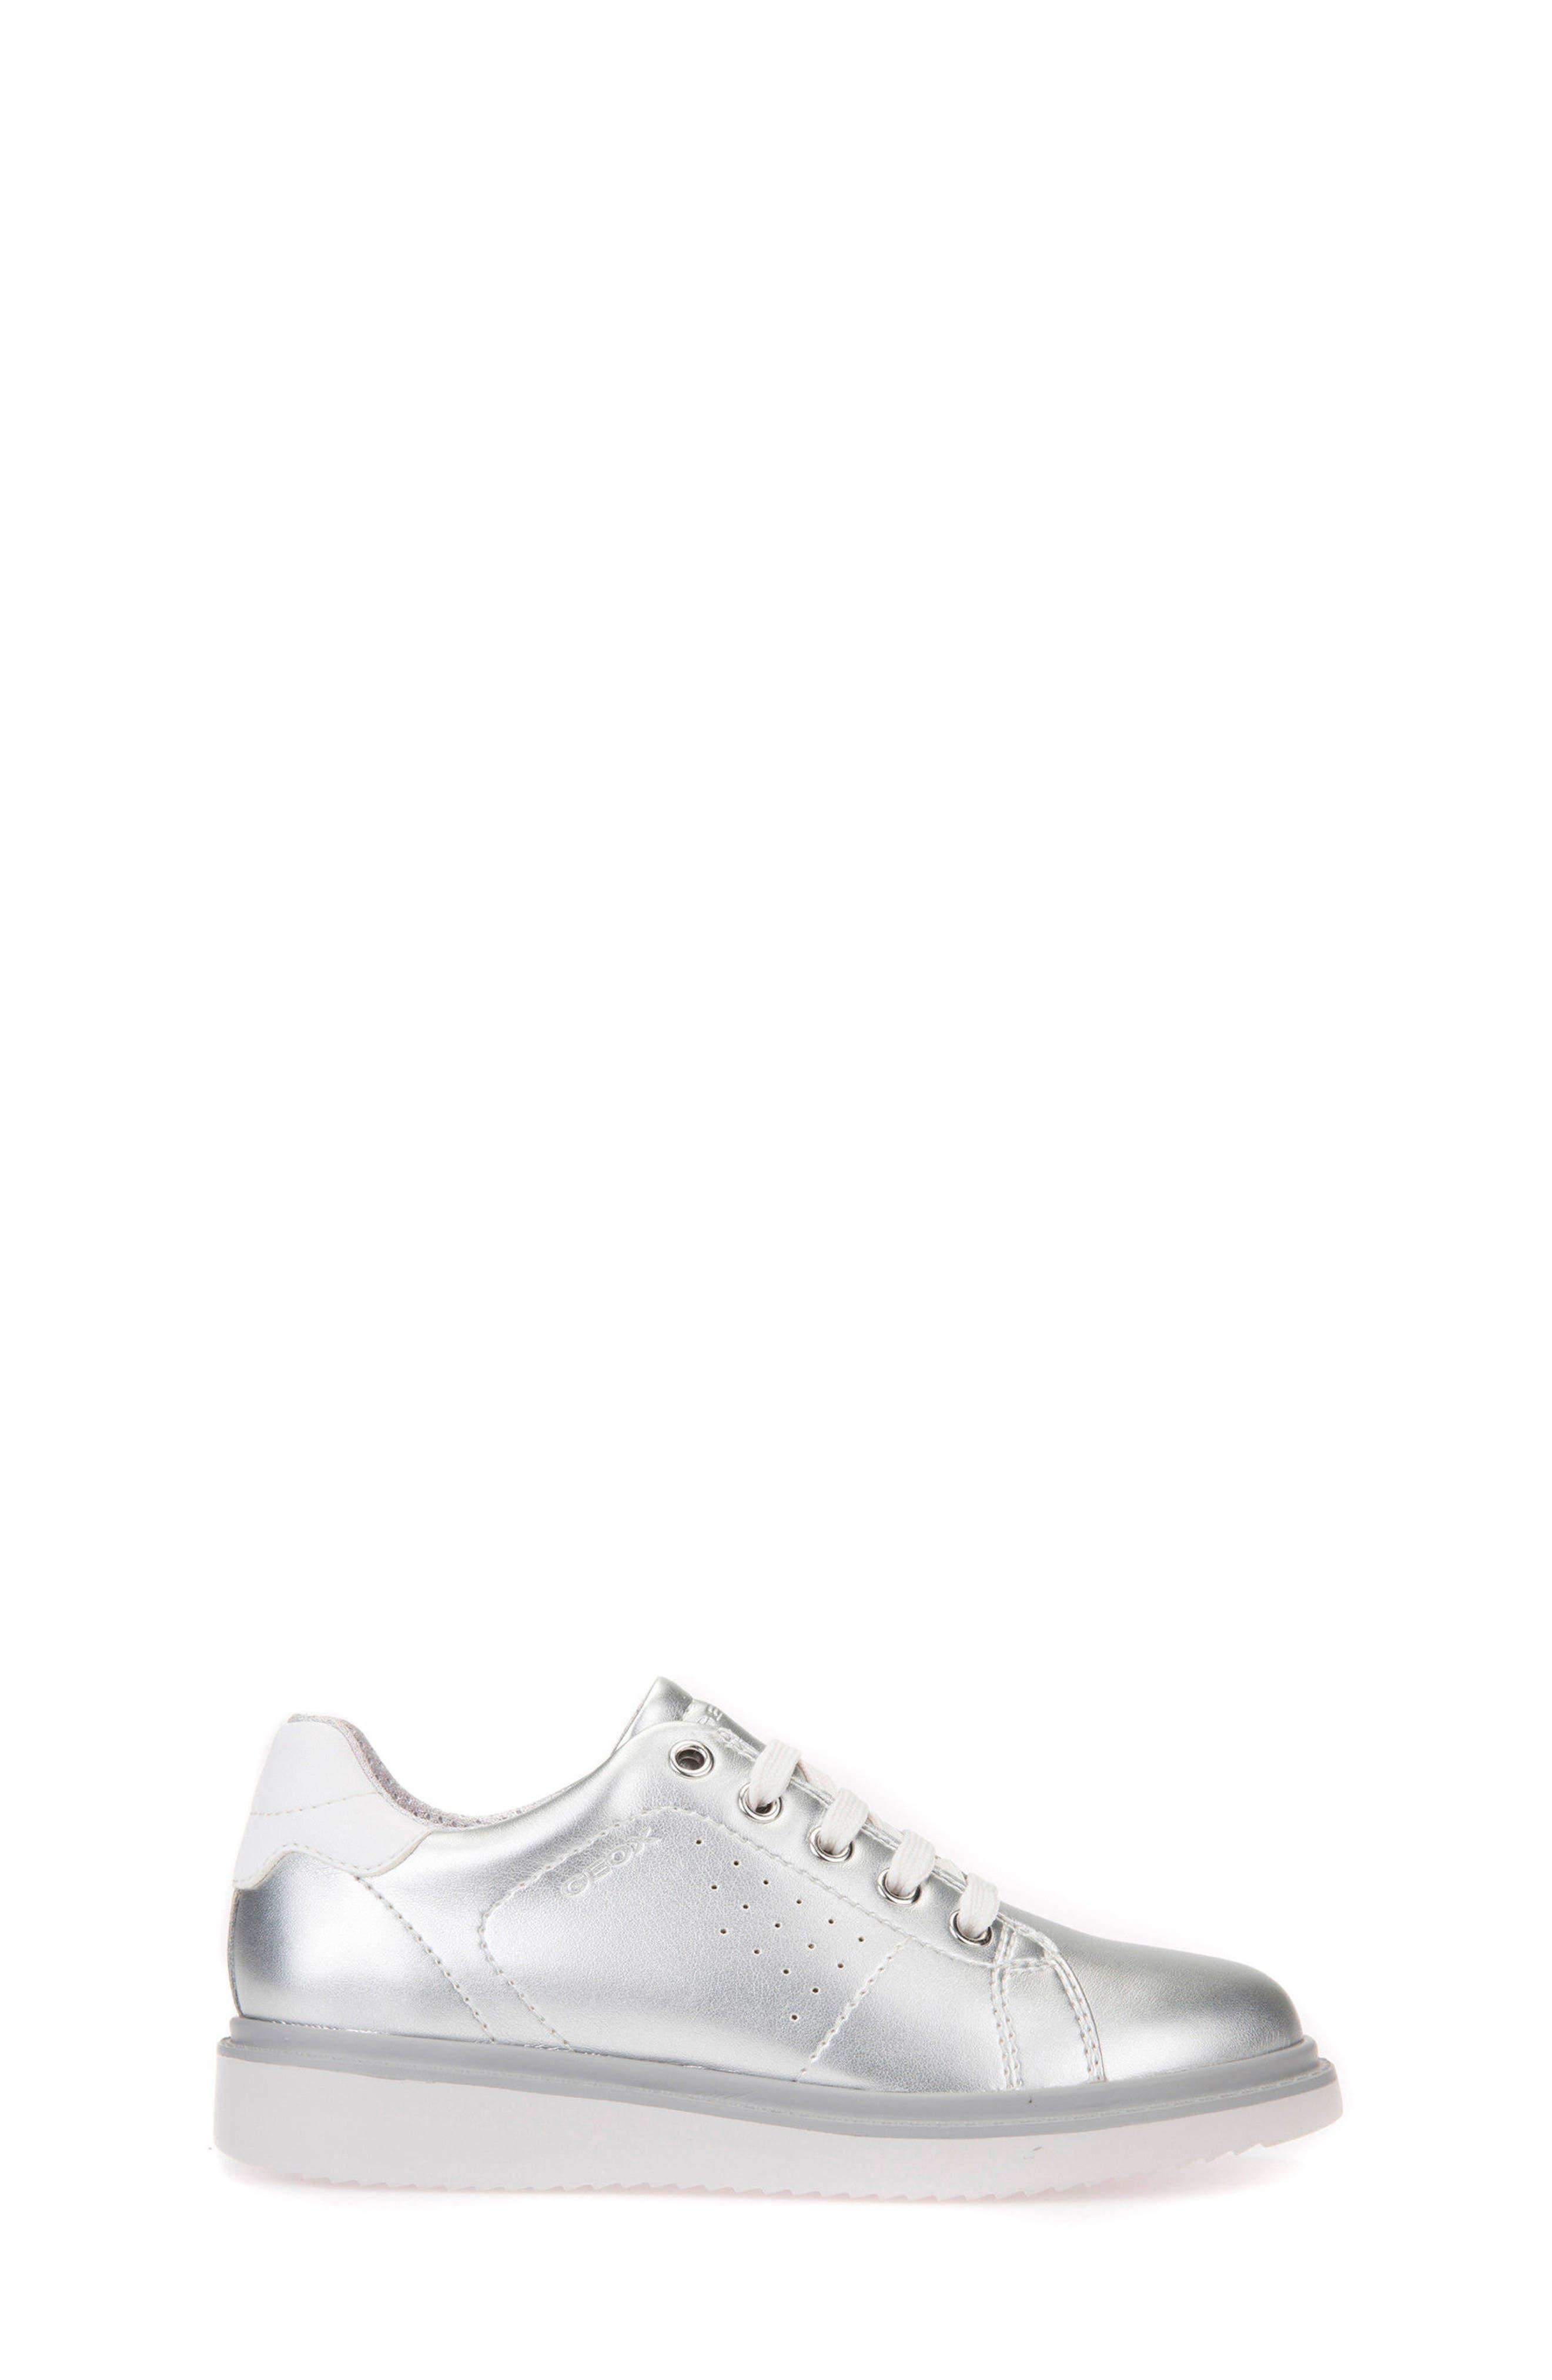 Thymar Low Top Sneaker,                             Alternate thumbnail 3, color,                             SILVER